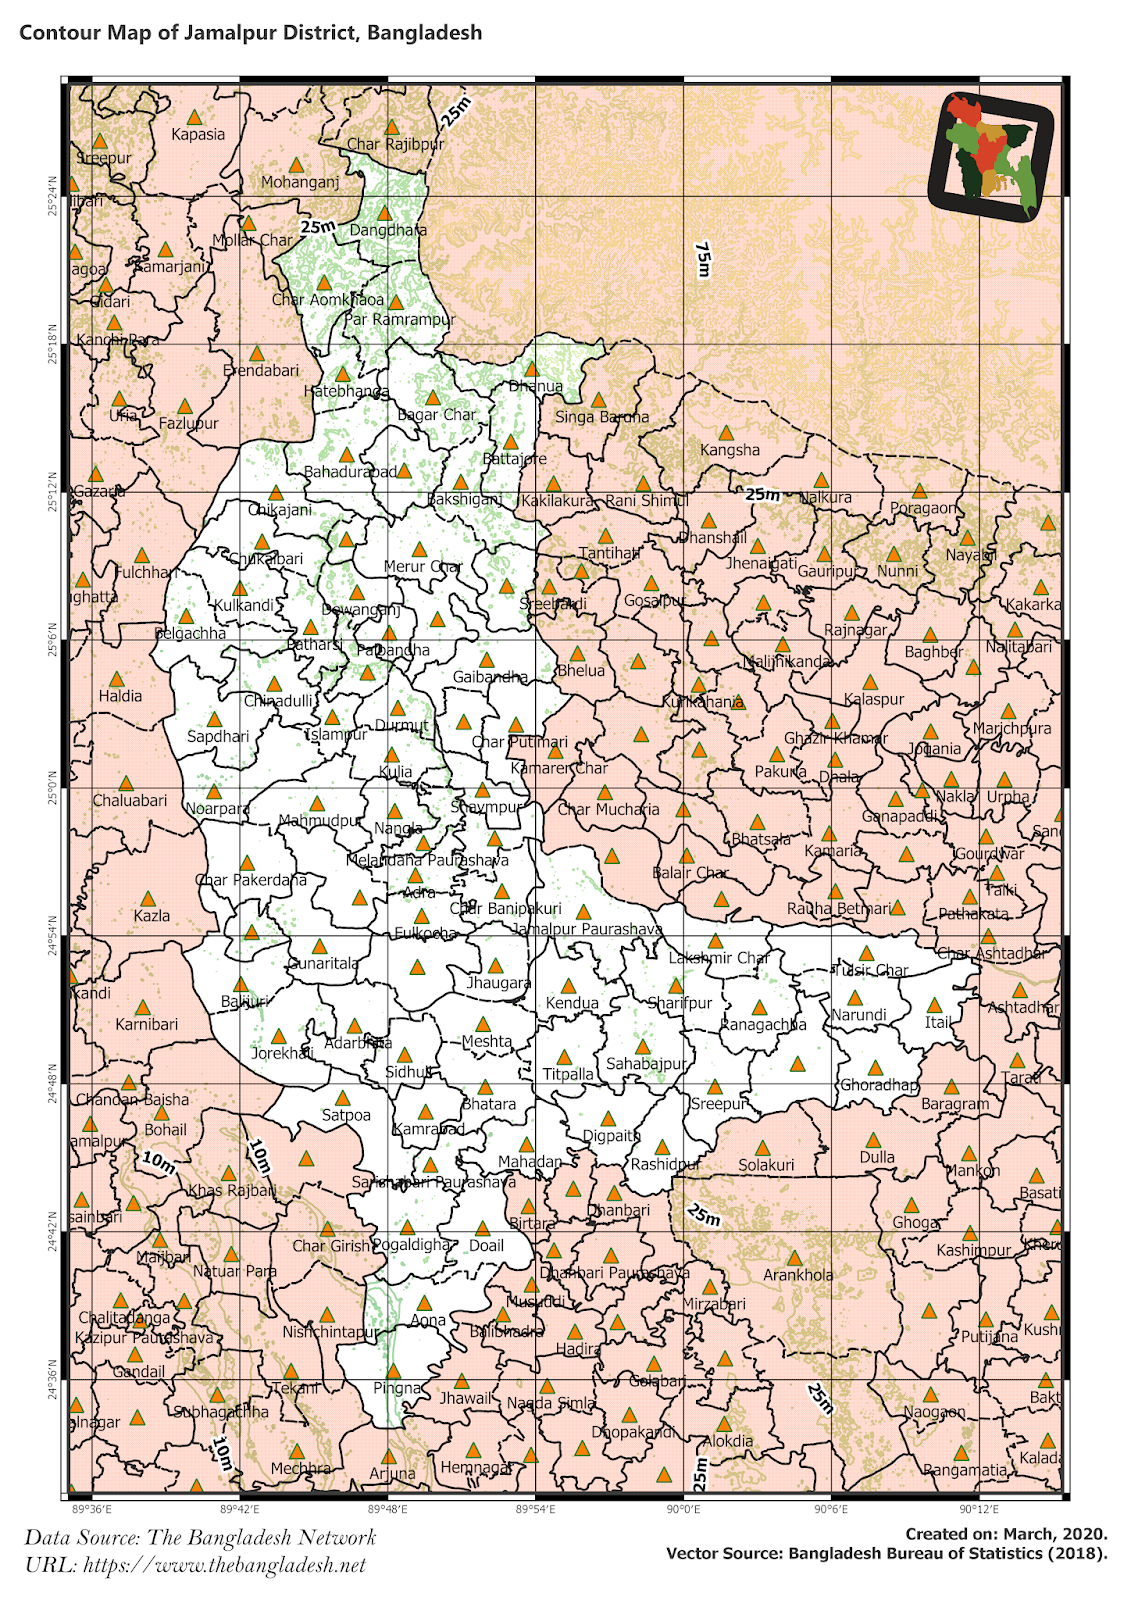 Elevation Map of Jamalpur District of Bangladesh